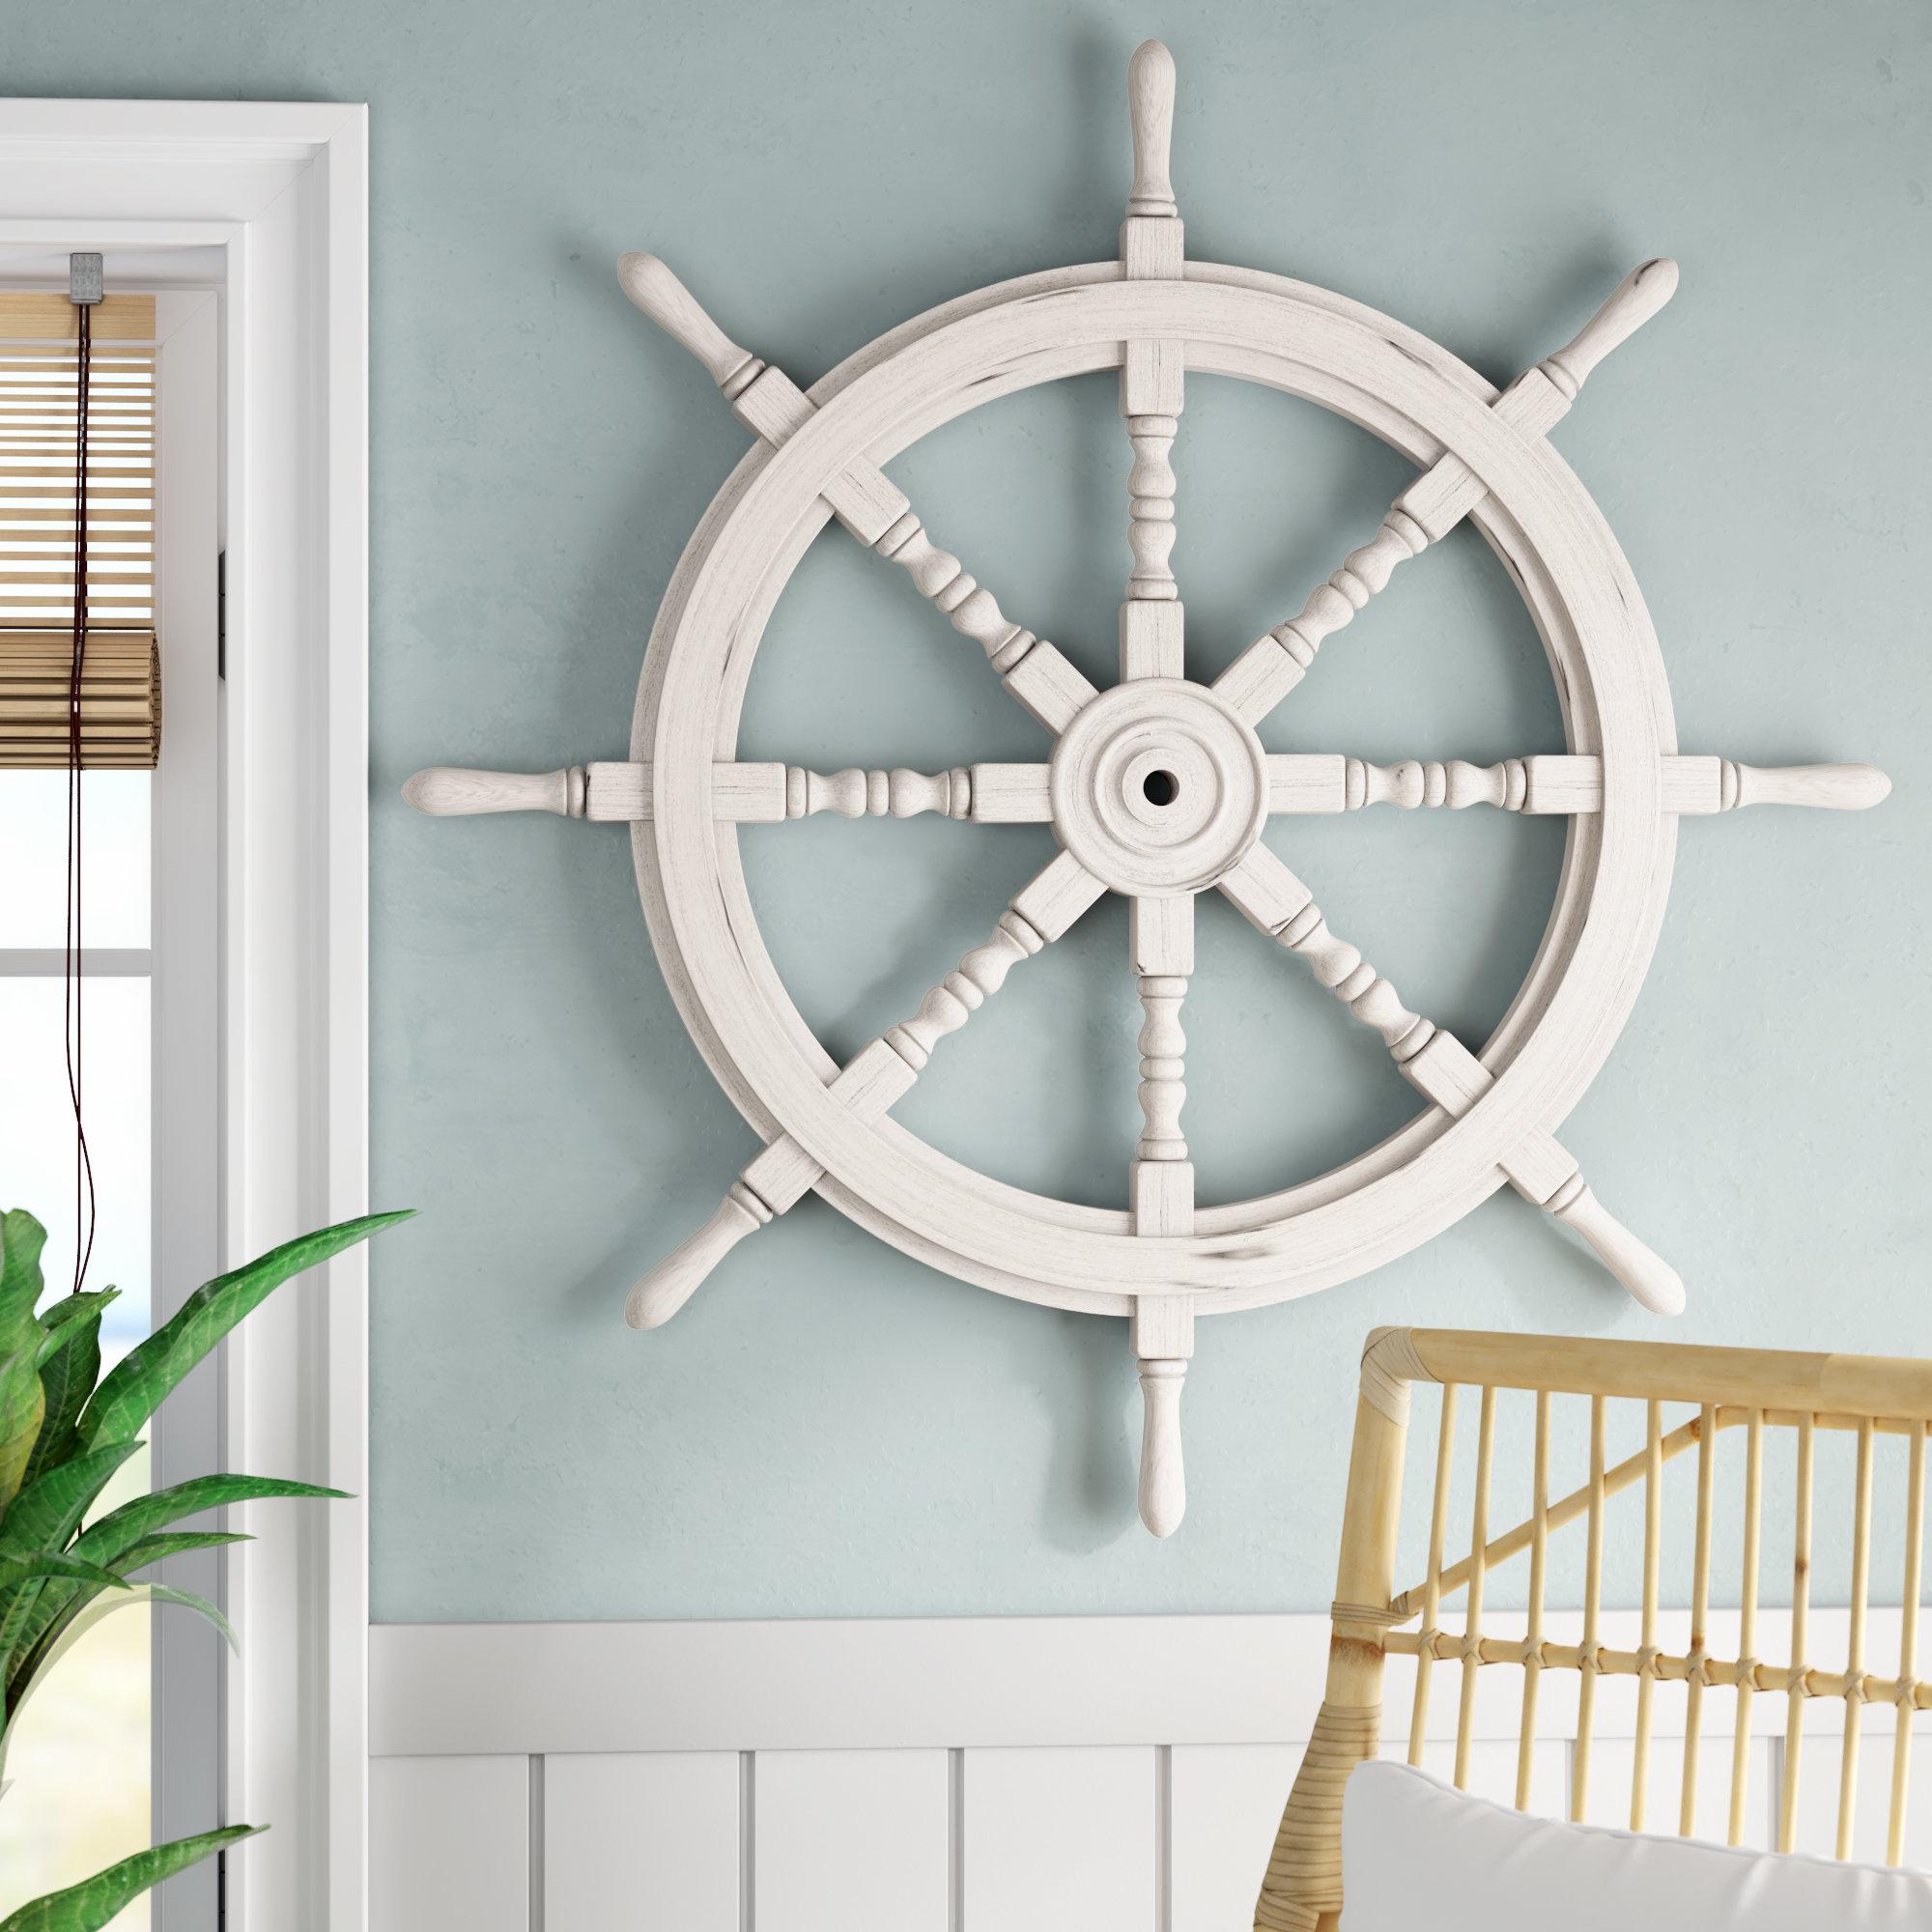 Captains Wheel Wall Decor | Wayfair regarding Millanocket Metal Wheel Photo Holder Wall Decor (Image 6 of 30)